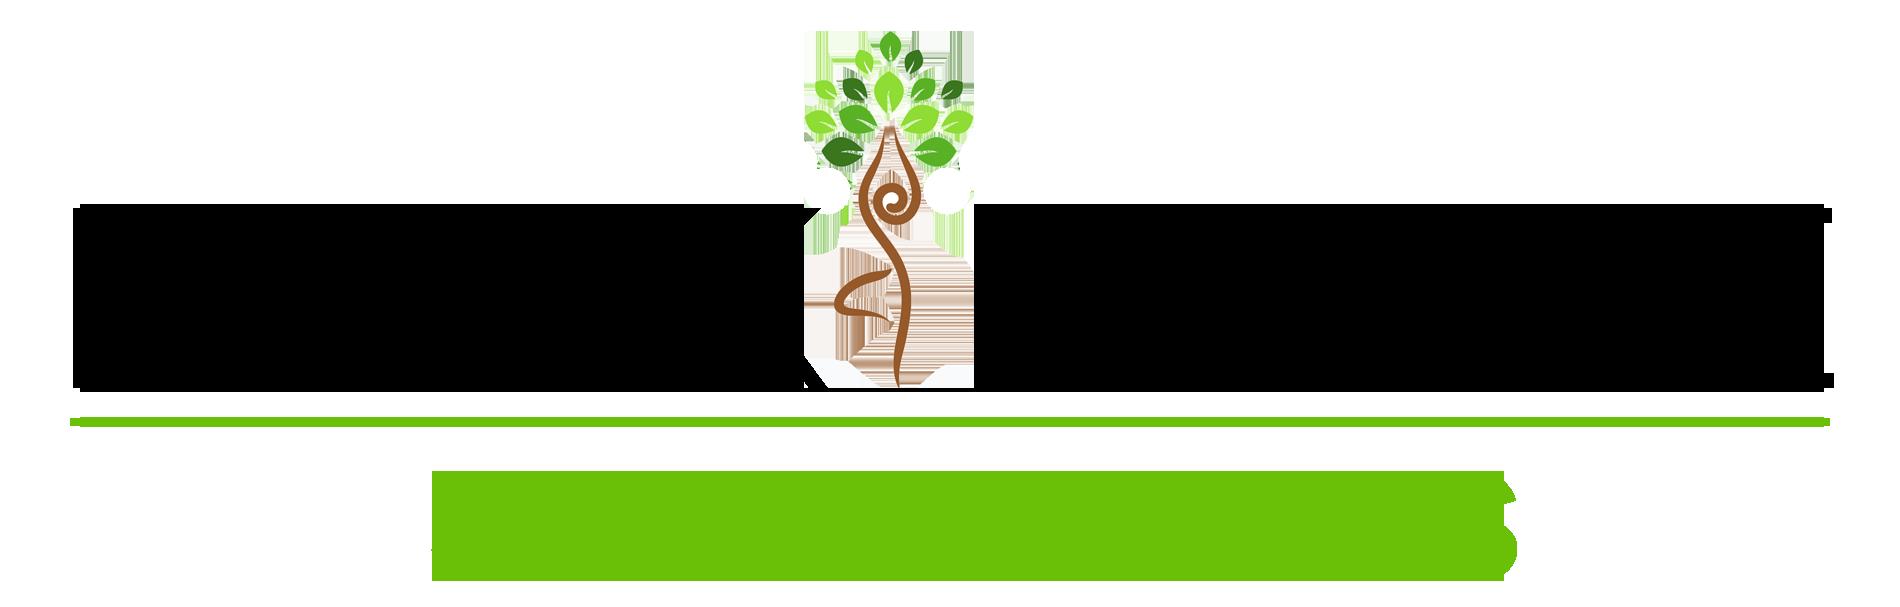 mn-skincare-logo-website-designer-blueprint-marketing-bakersfield-ca